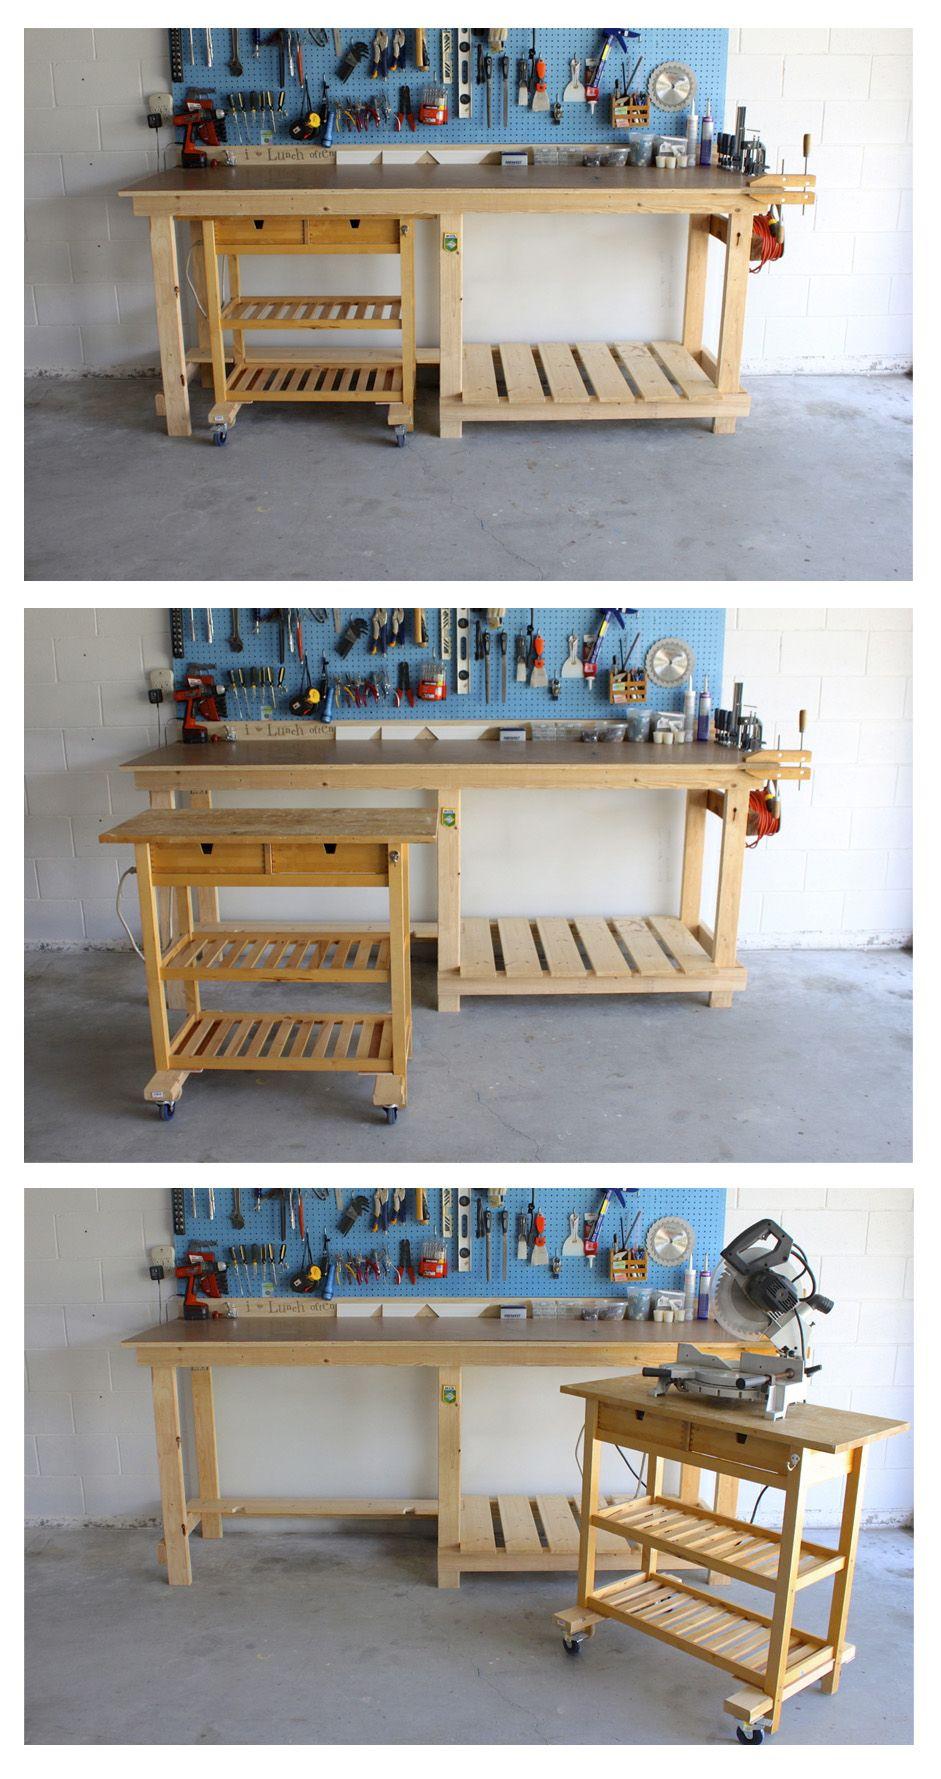 Ikea Gartenbank ikea hack mit ikea möbeln gartenbank selber bauen diy workbench